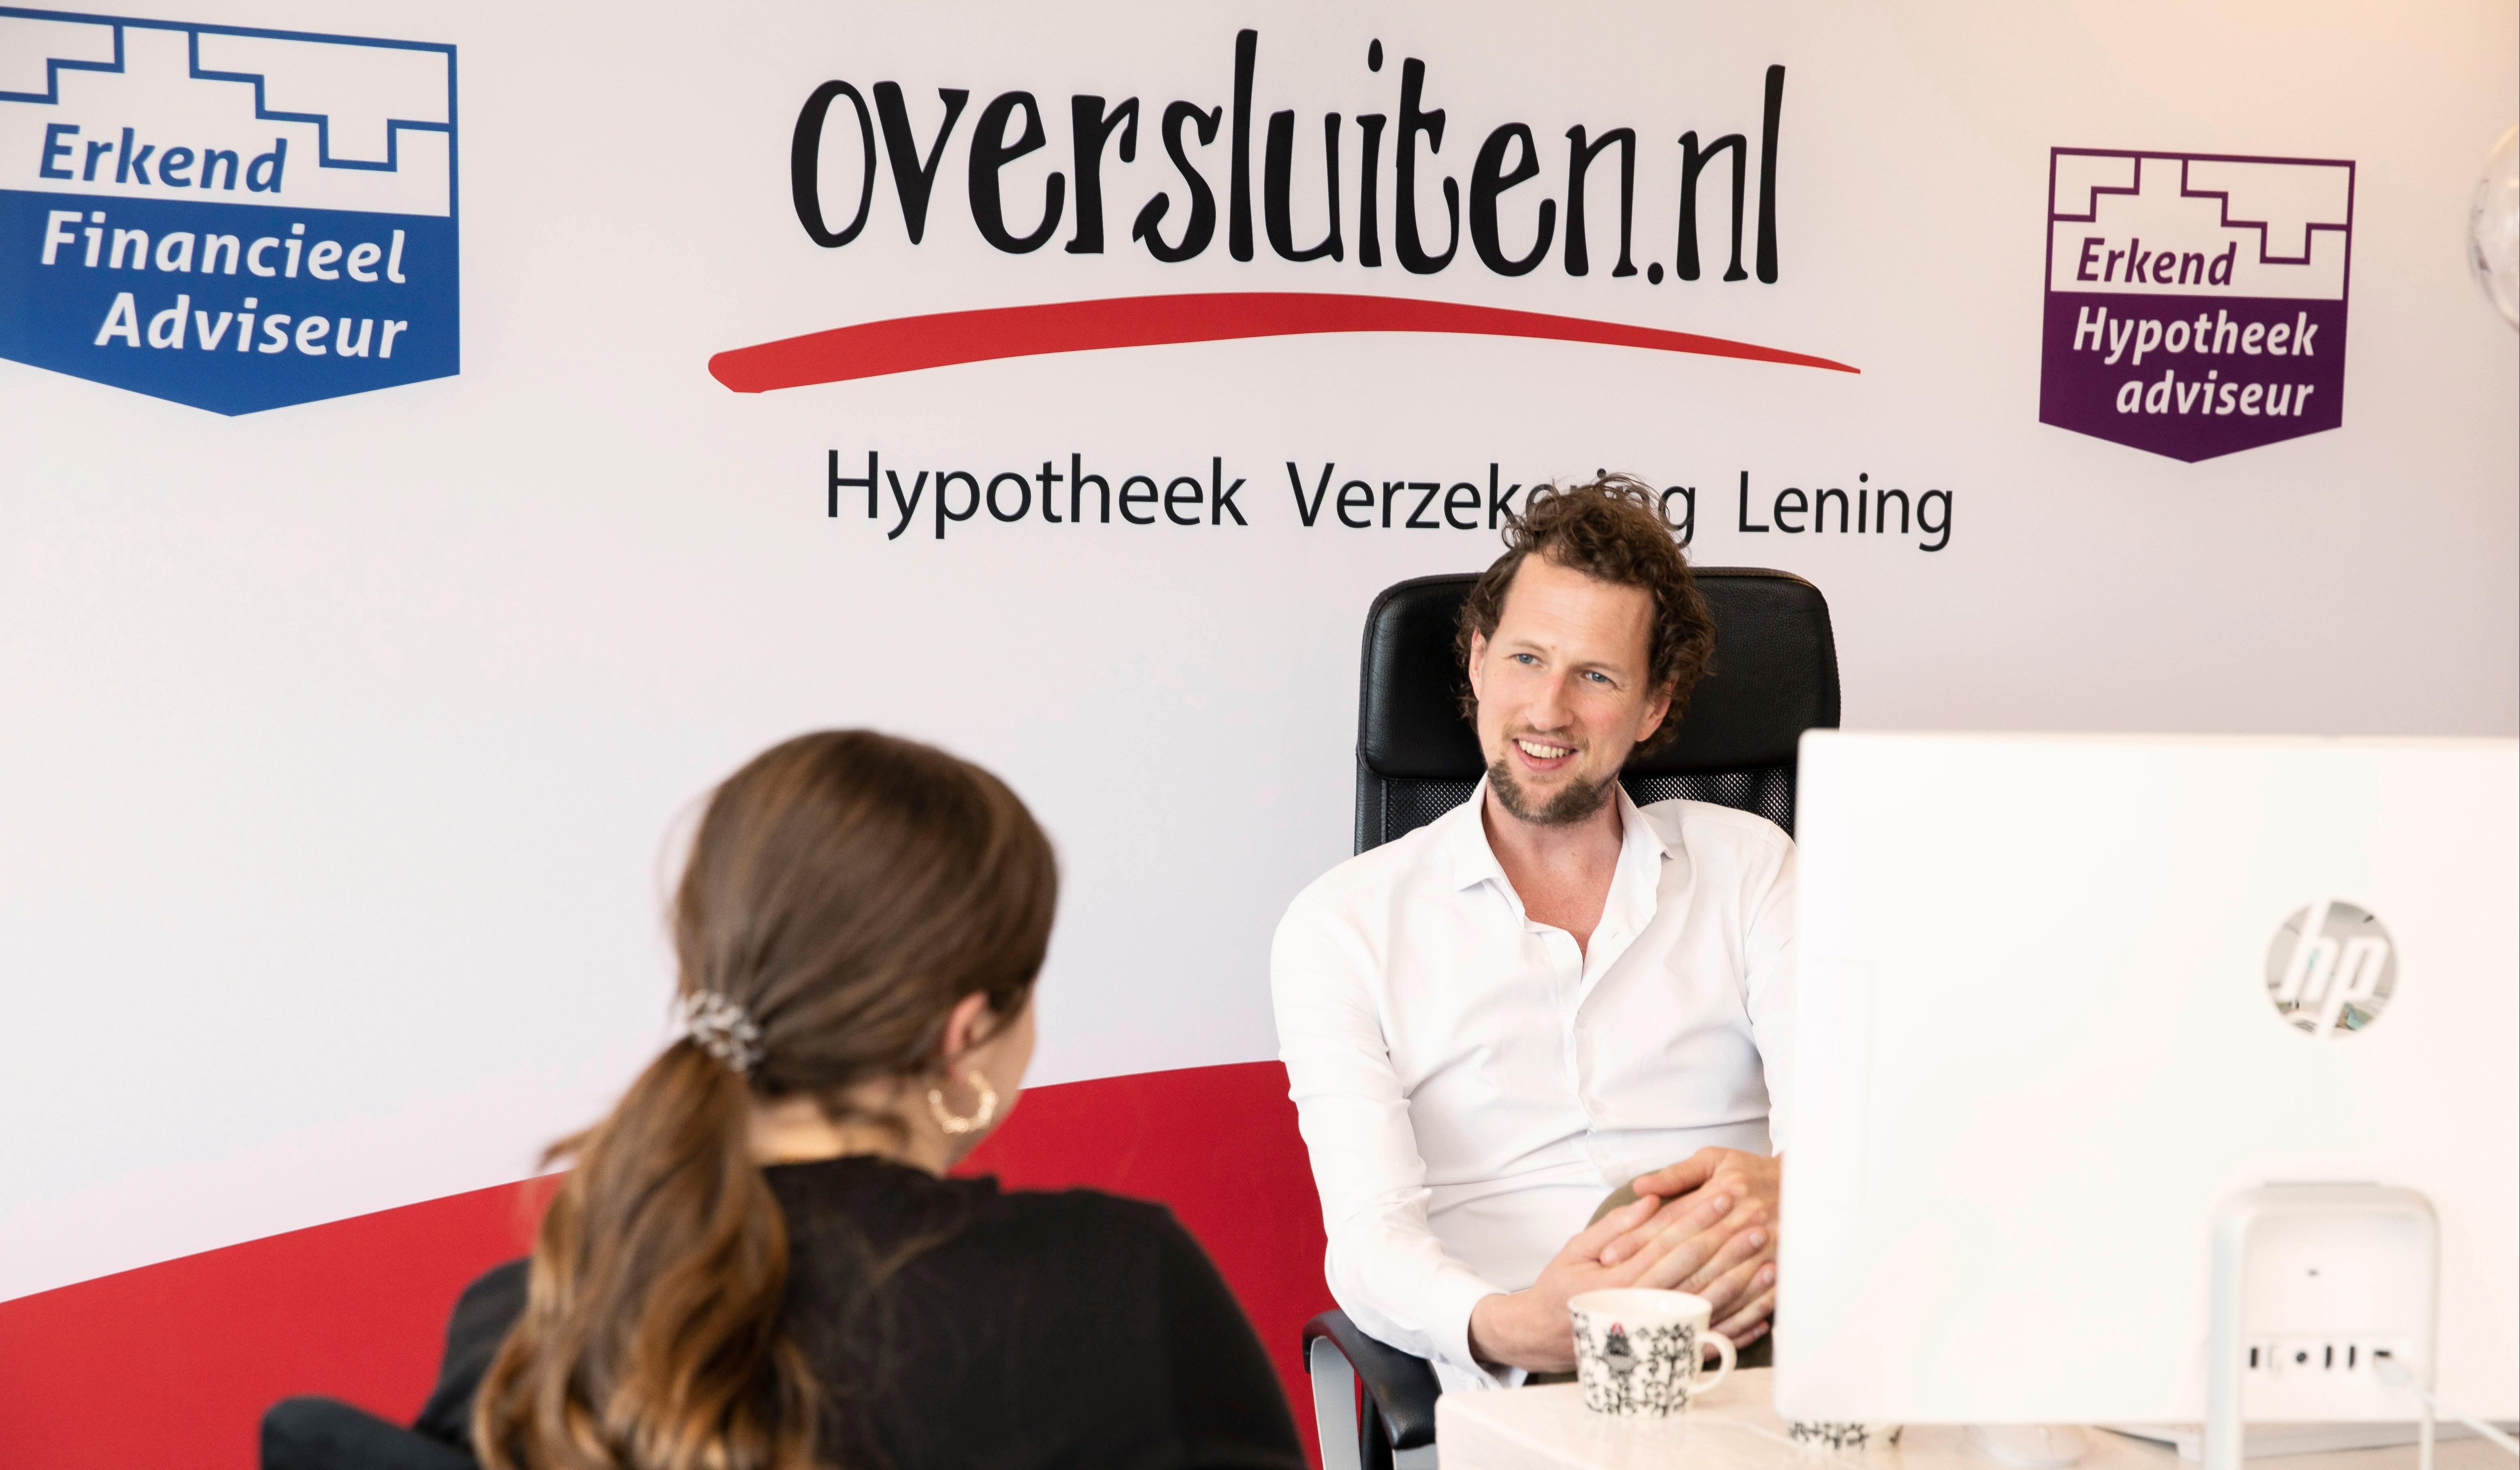 Ervaringen Oversluiten.nl